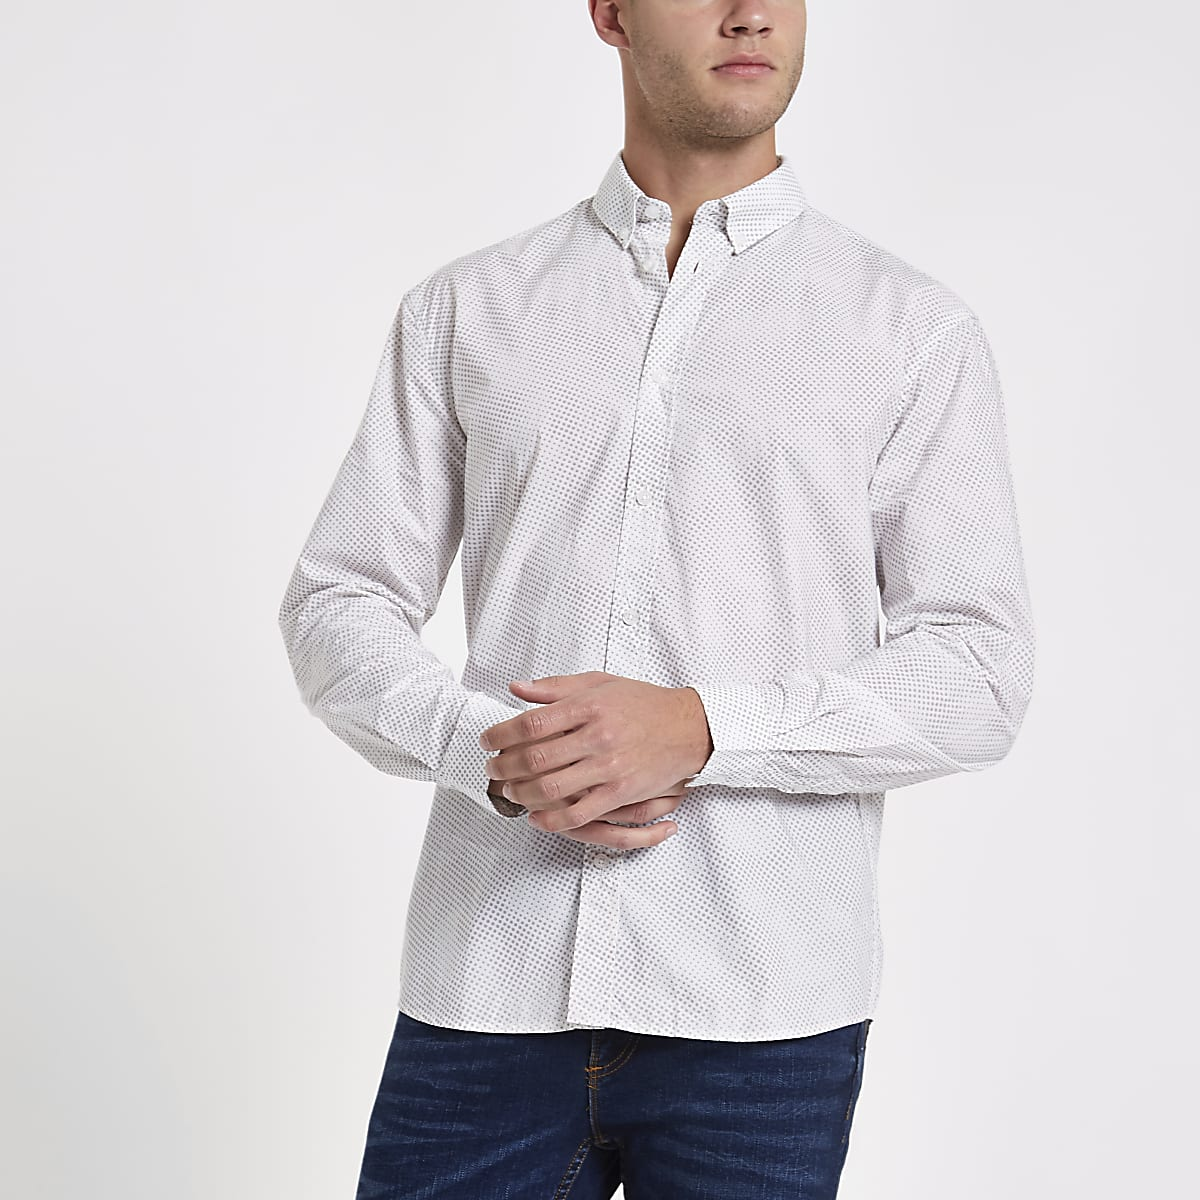 Minimum grey spot shirt